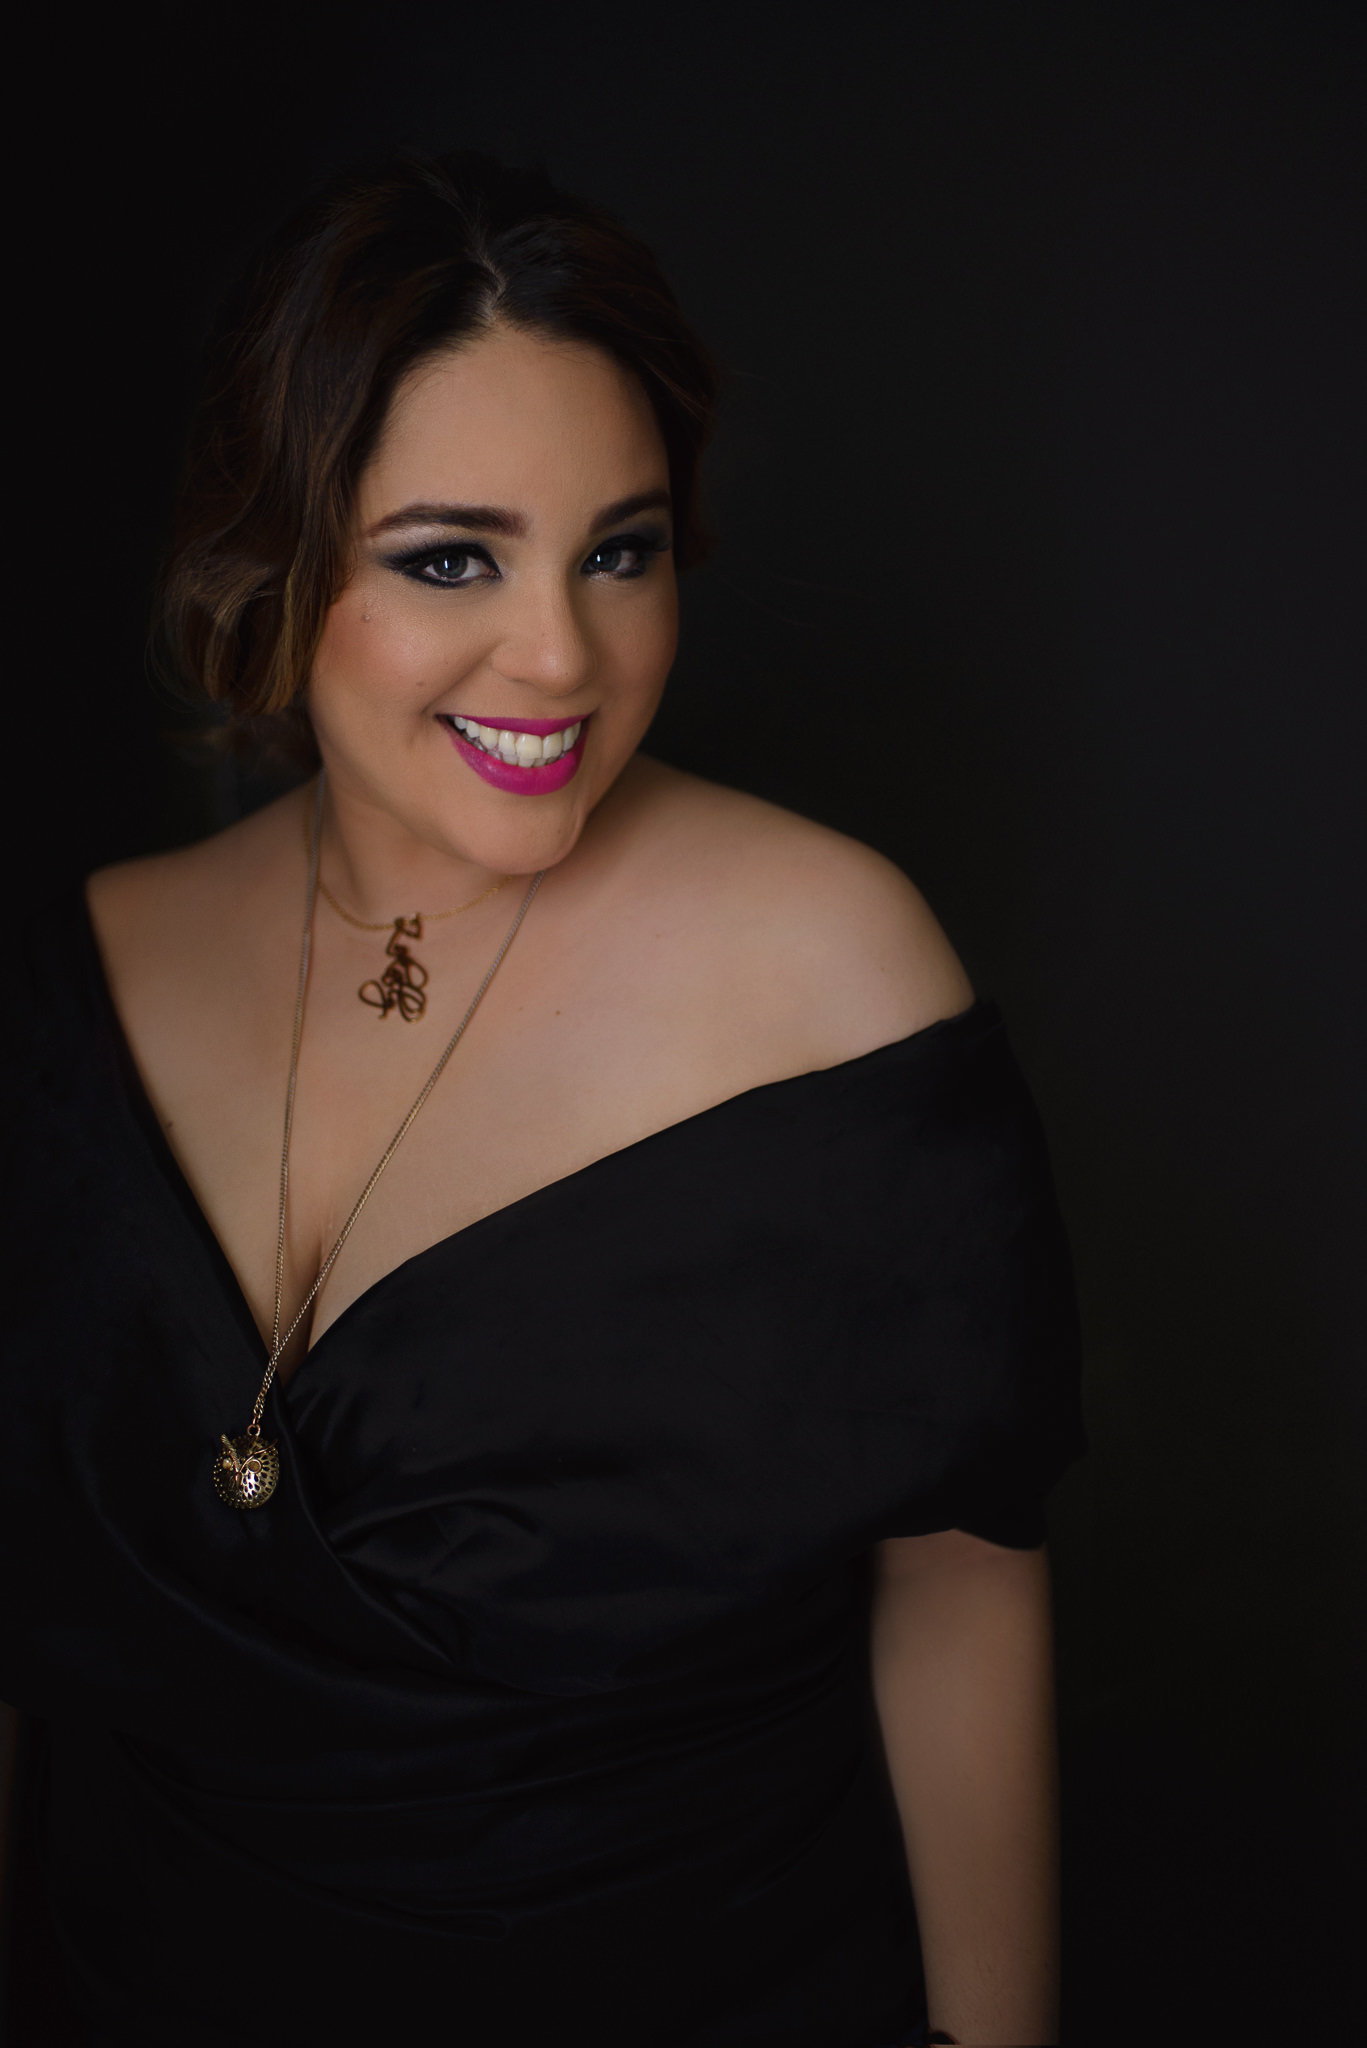 Melissa-Alcantar-Fotografia-Sesion-fotos-mexicali-retrato-Sokally-Trejo